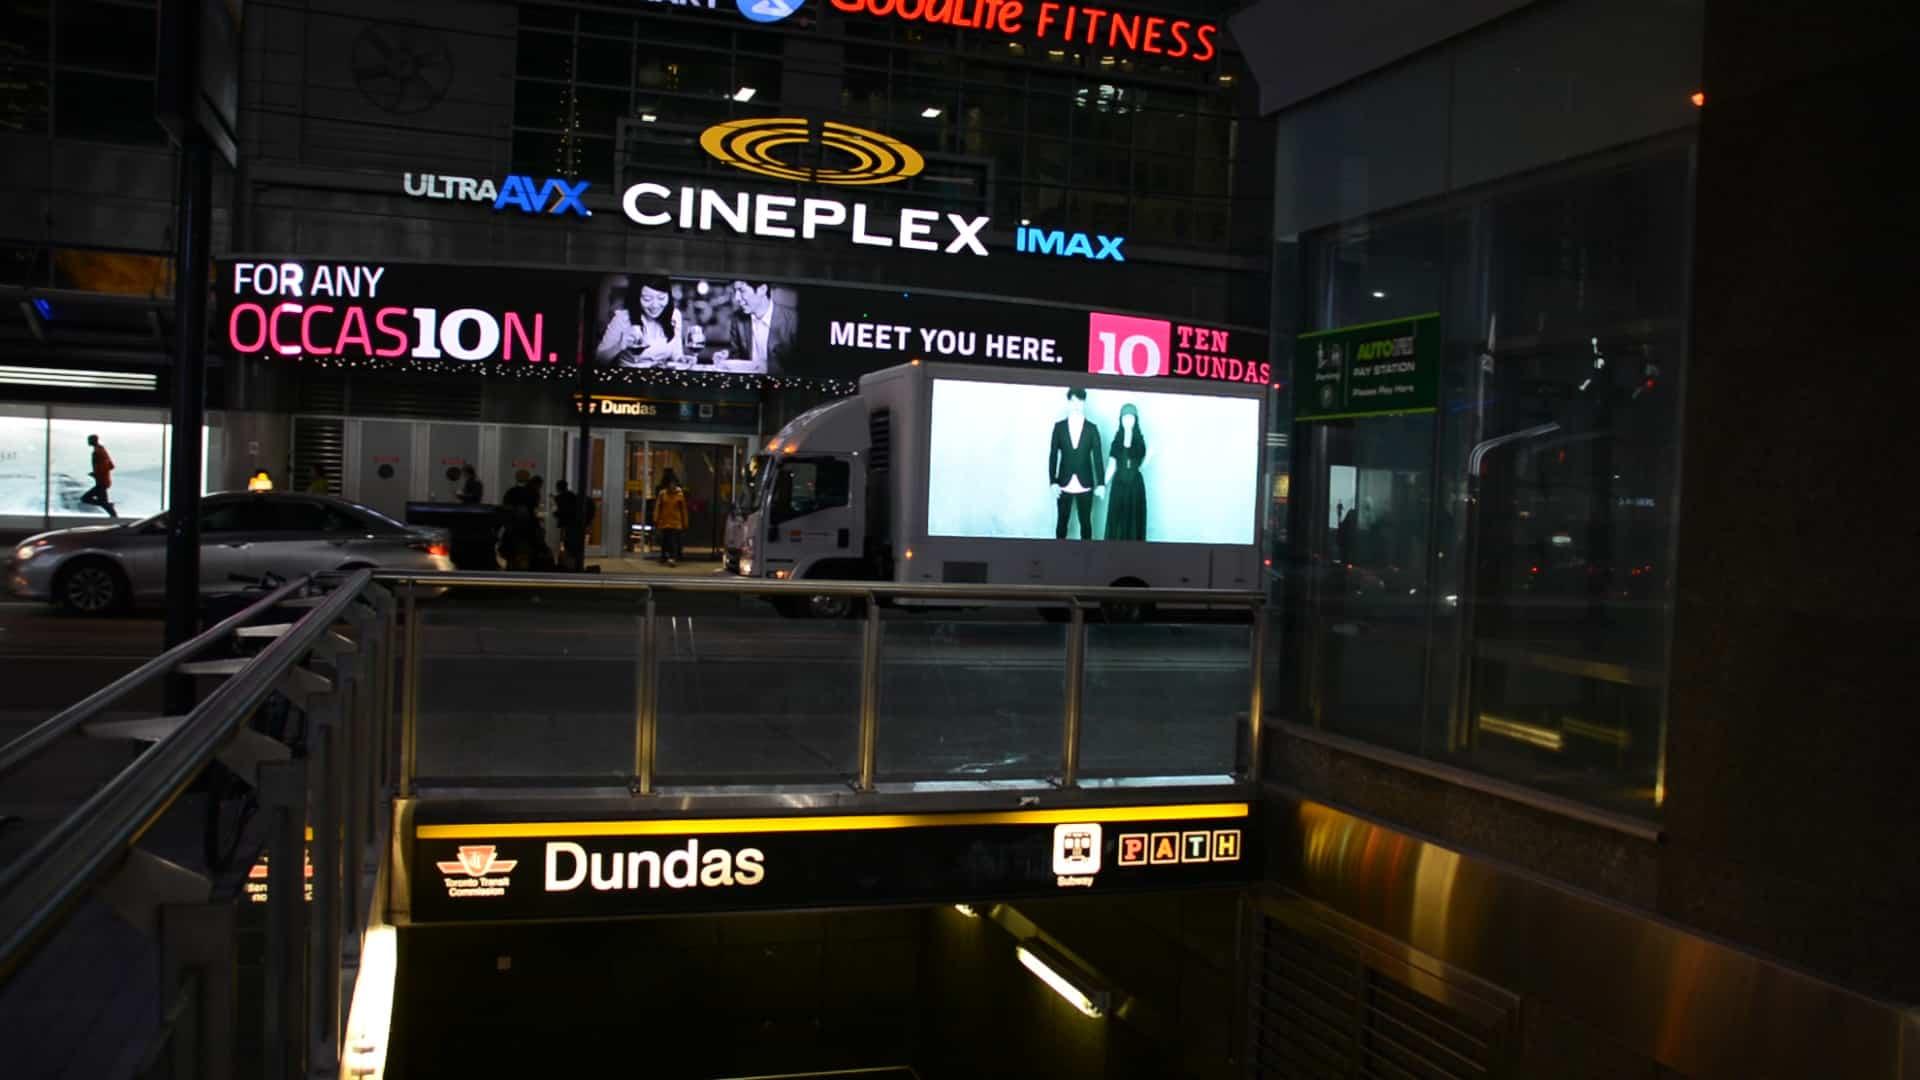 Digital ad truck in Toronto